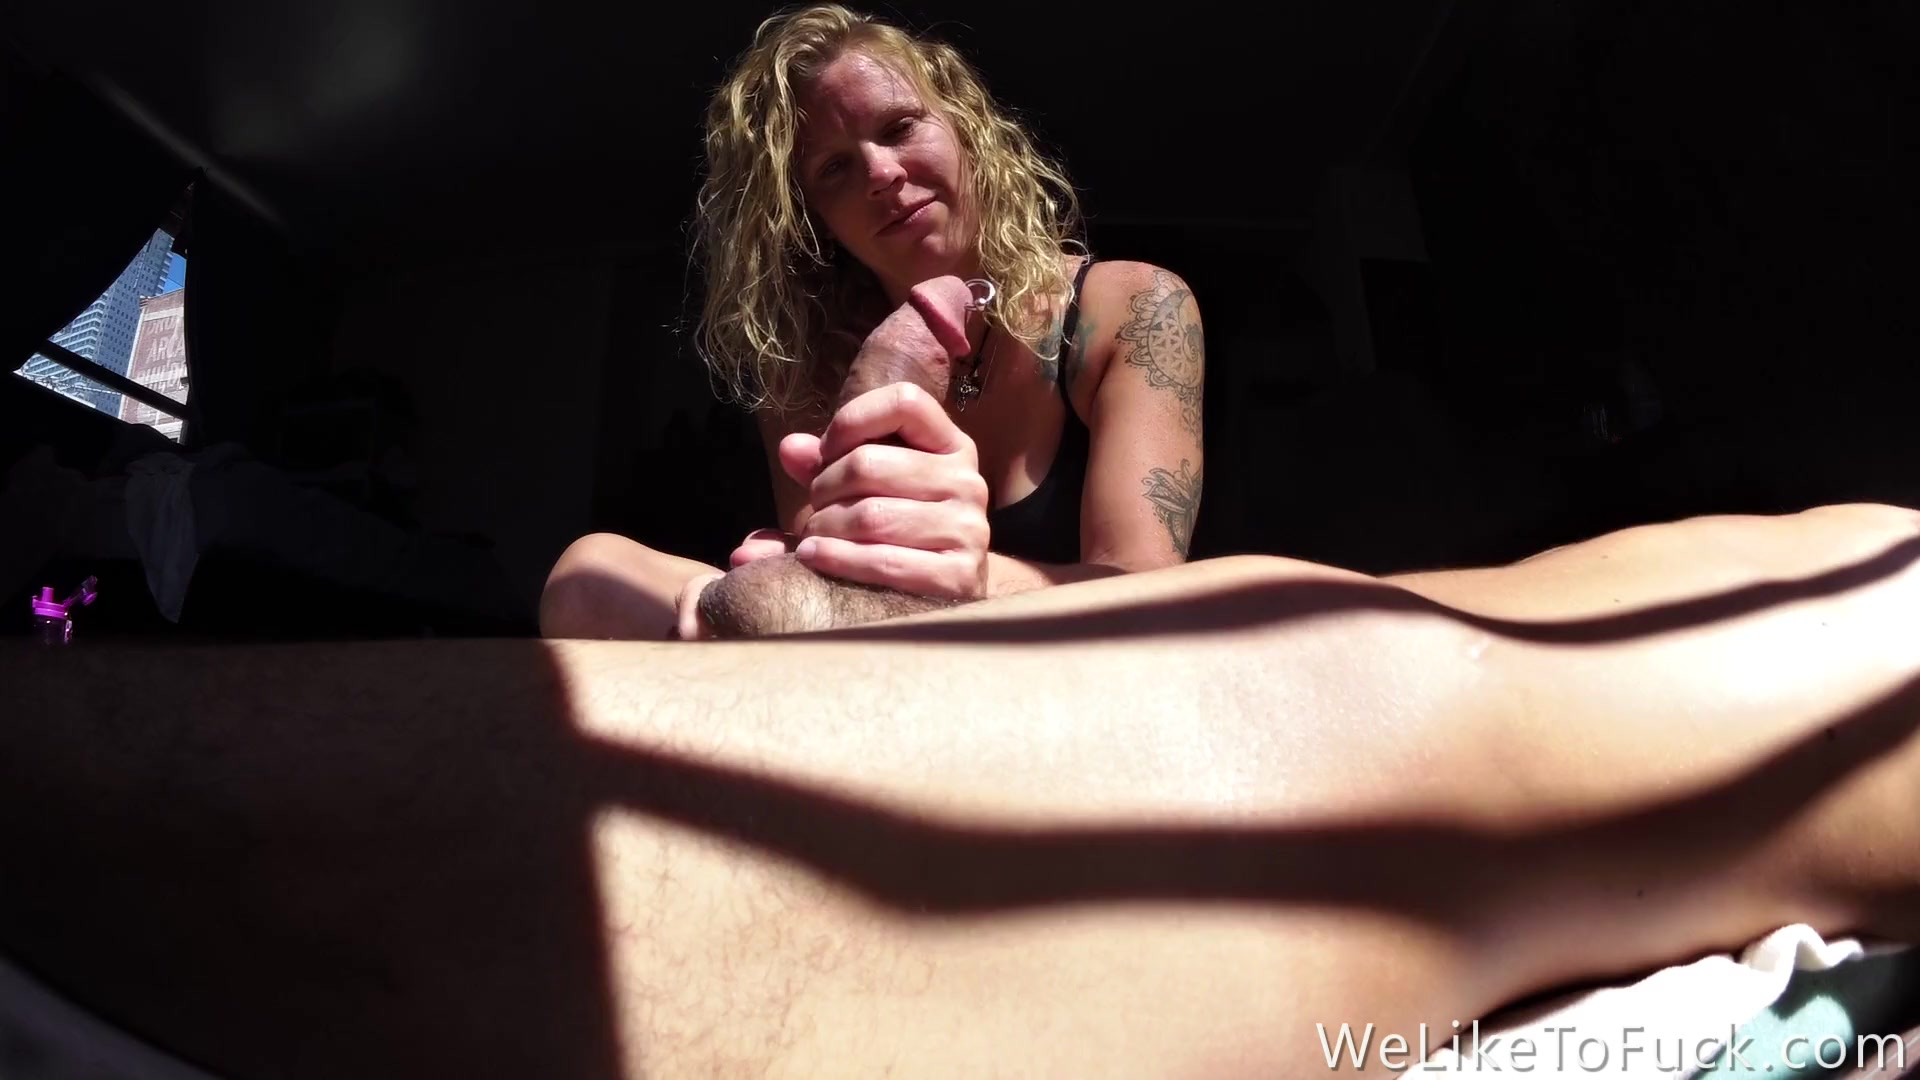 kelly divine upskirt interracial anal